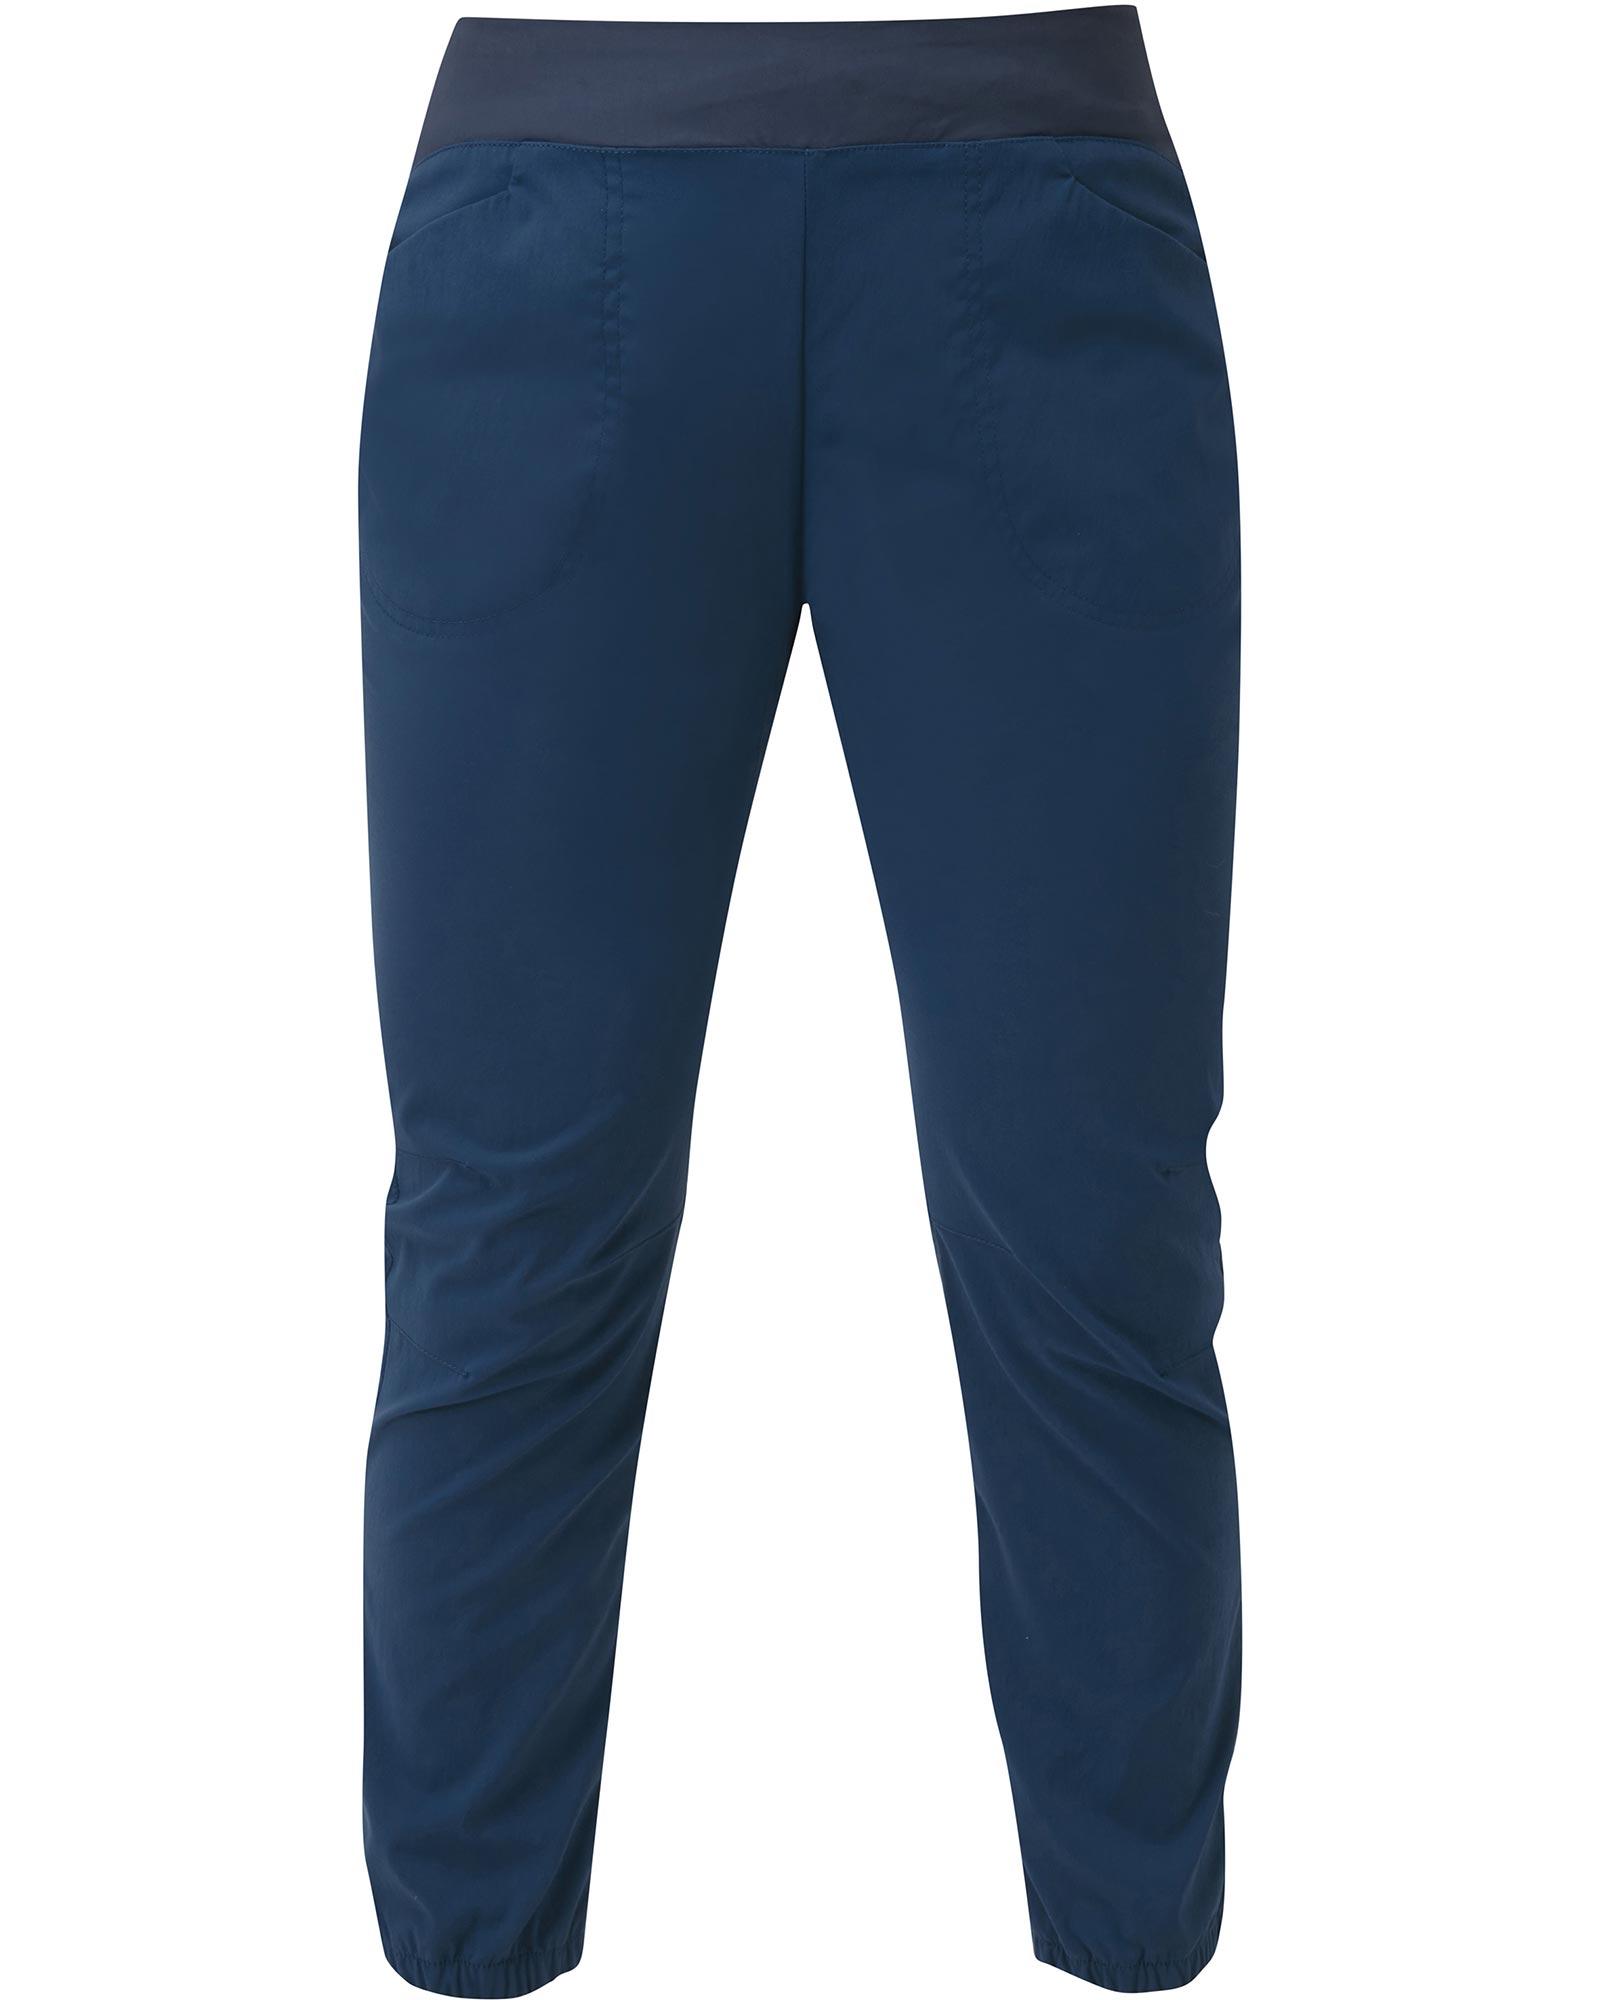 Mountain Equipment Women's Dihedral Crop Pants 0